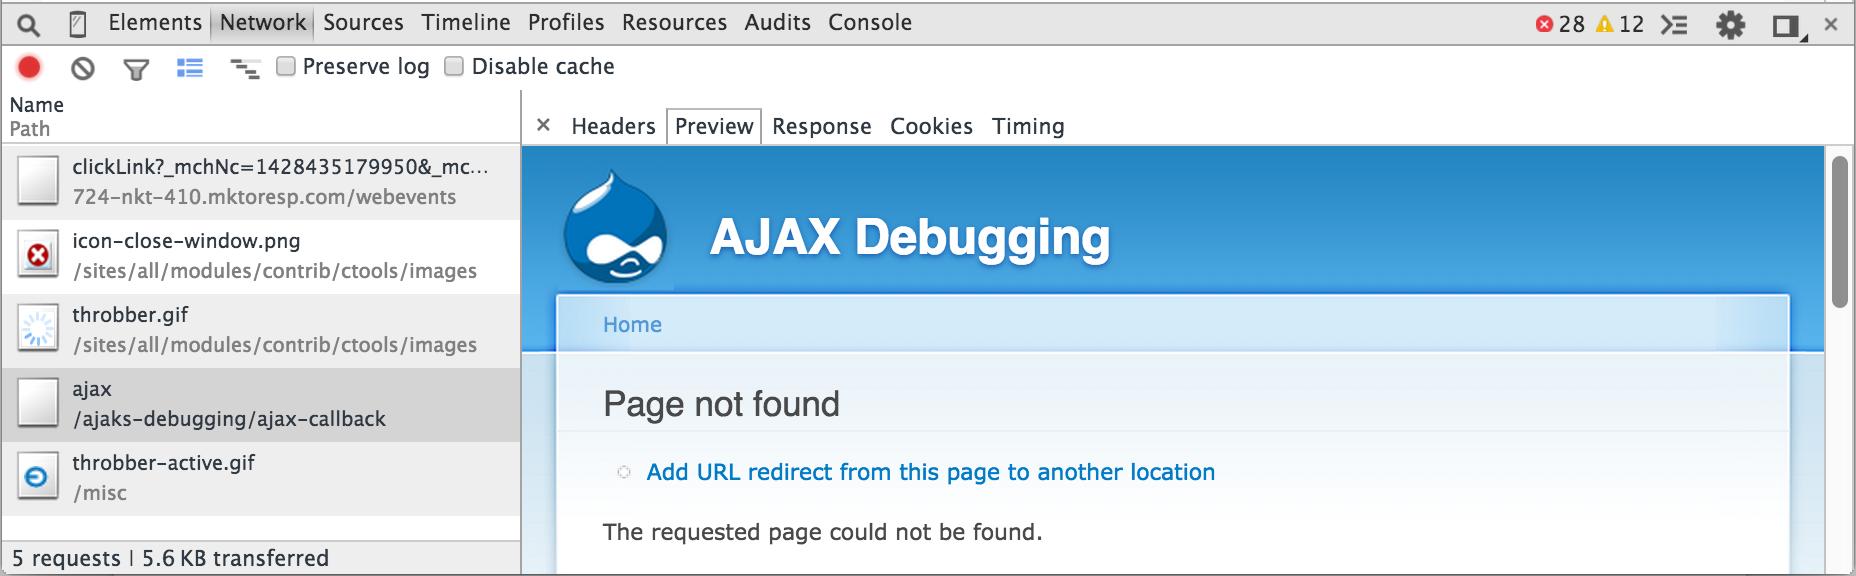 AJAX Debugging Page Not Found